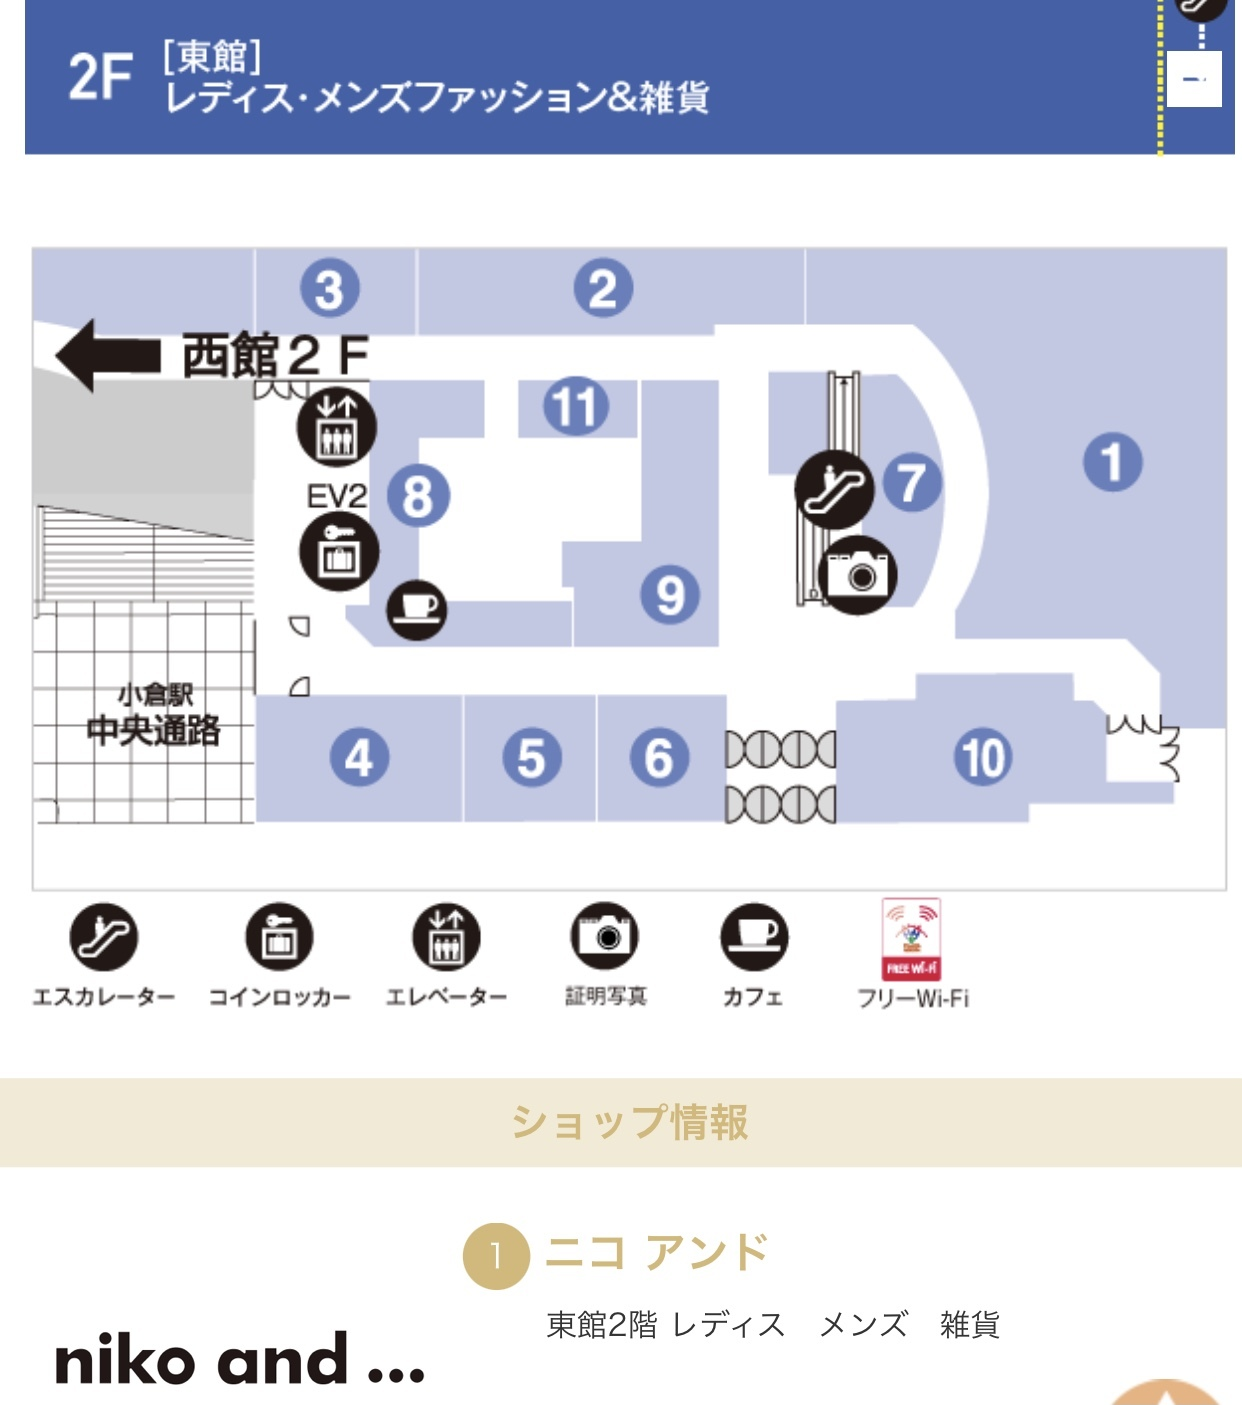 mimosa.さんのpopup shopは明日12/1(火)から🎁@福岡・アミュプラザ小倉_a0137727_17022608.jpeg